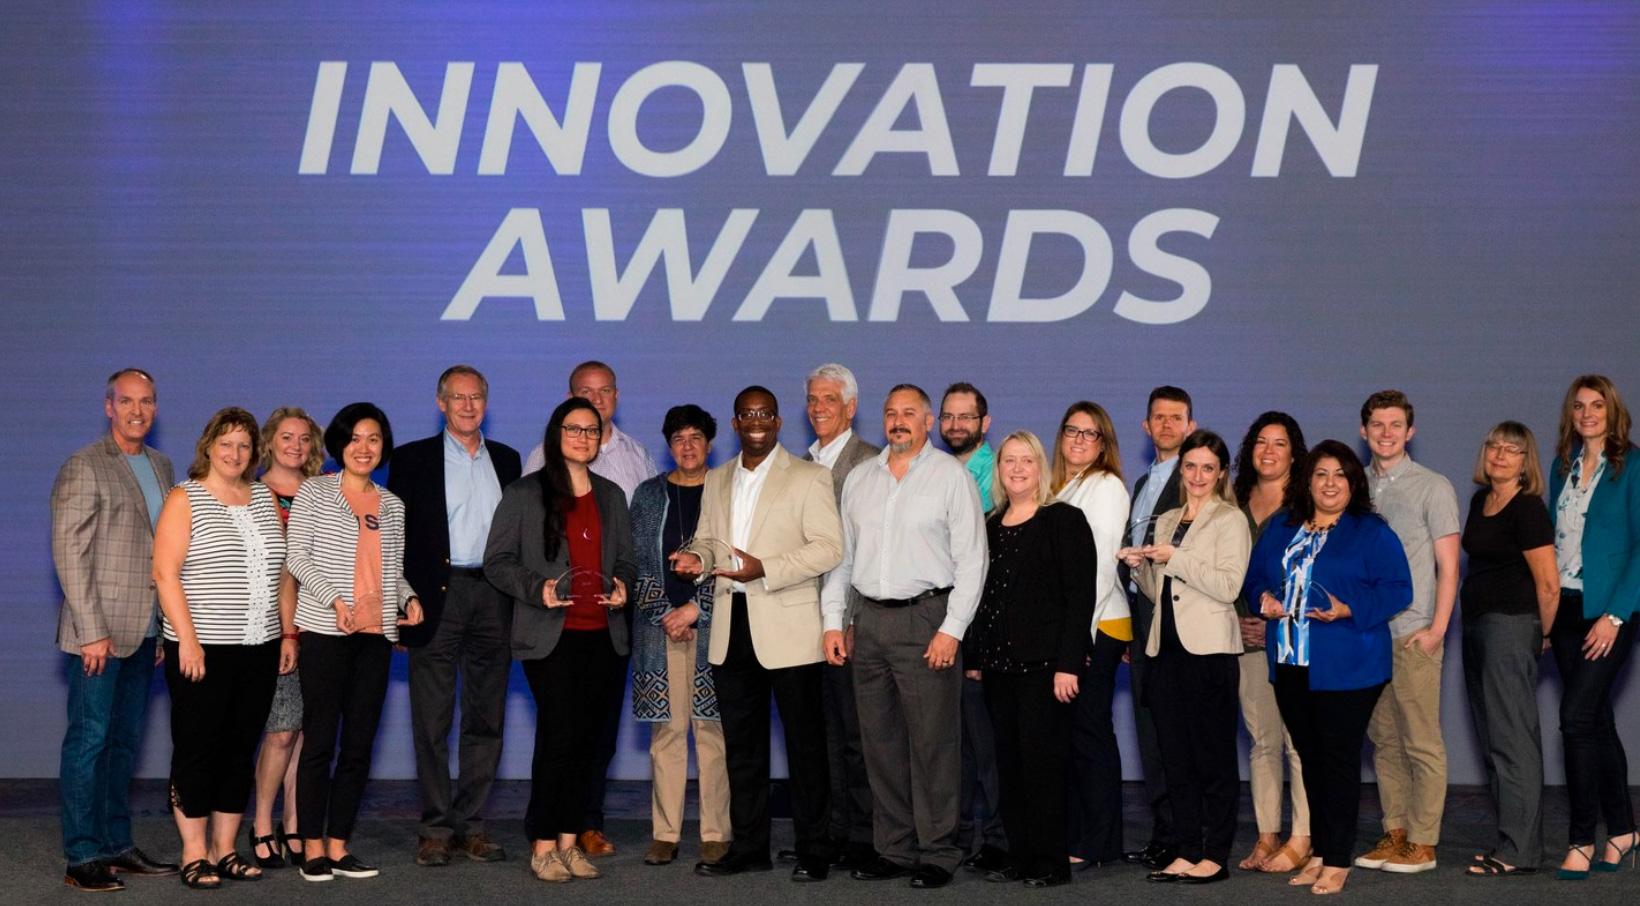 Innovation Award Winners